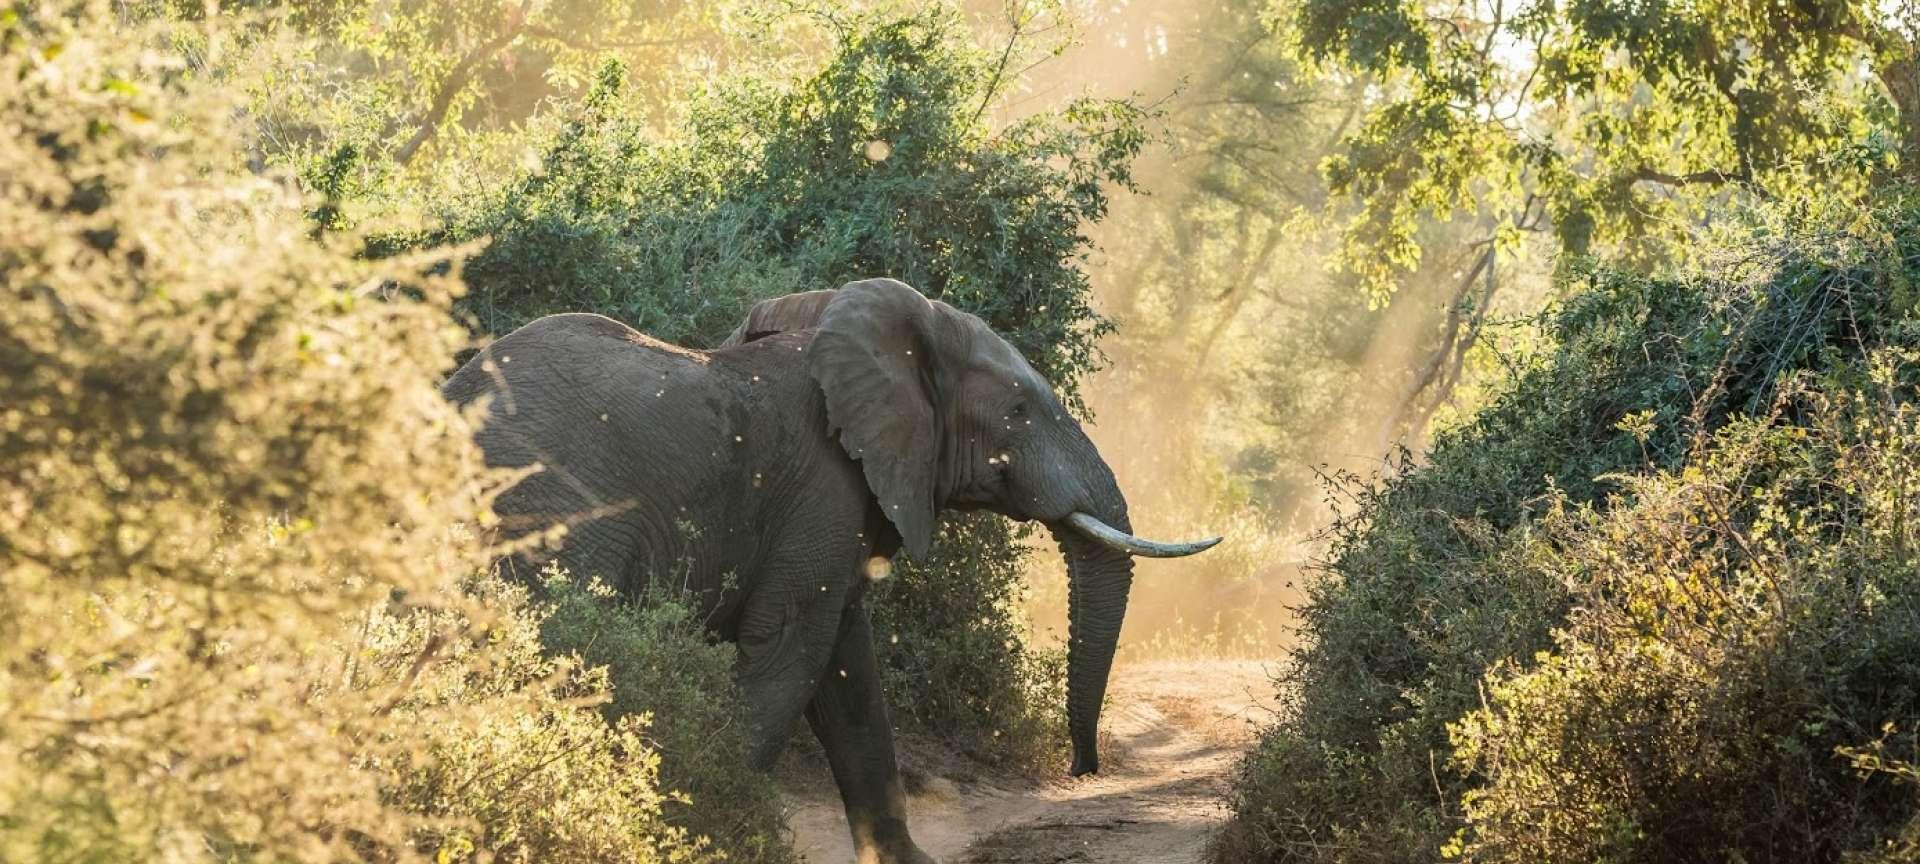 Luxury Safari Tanzania - Africa Wildlife Safaris